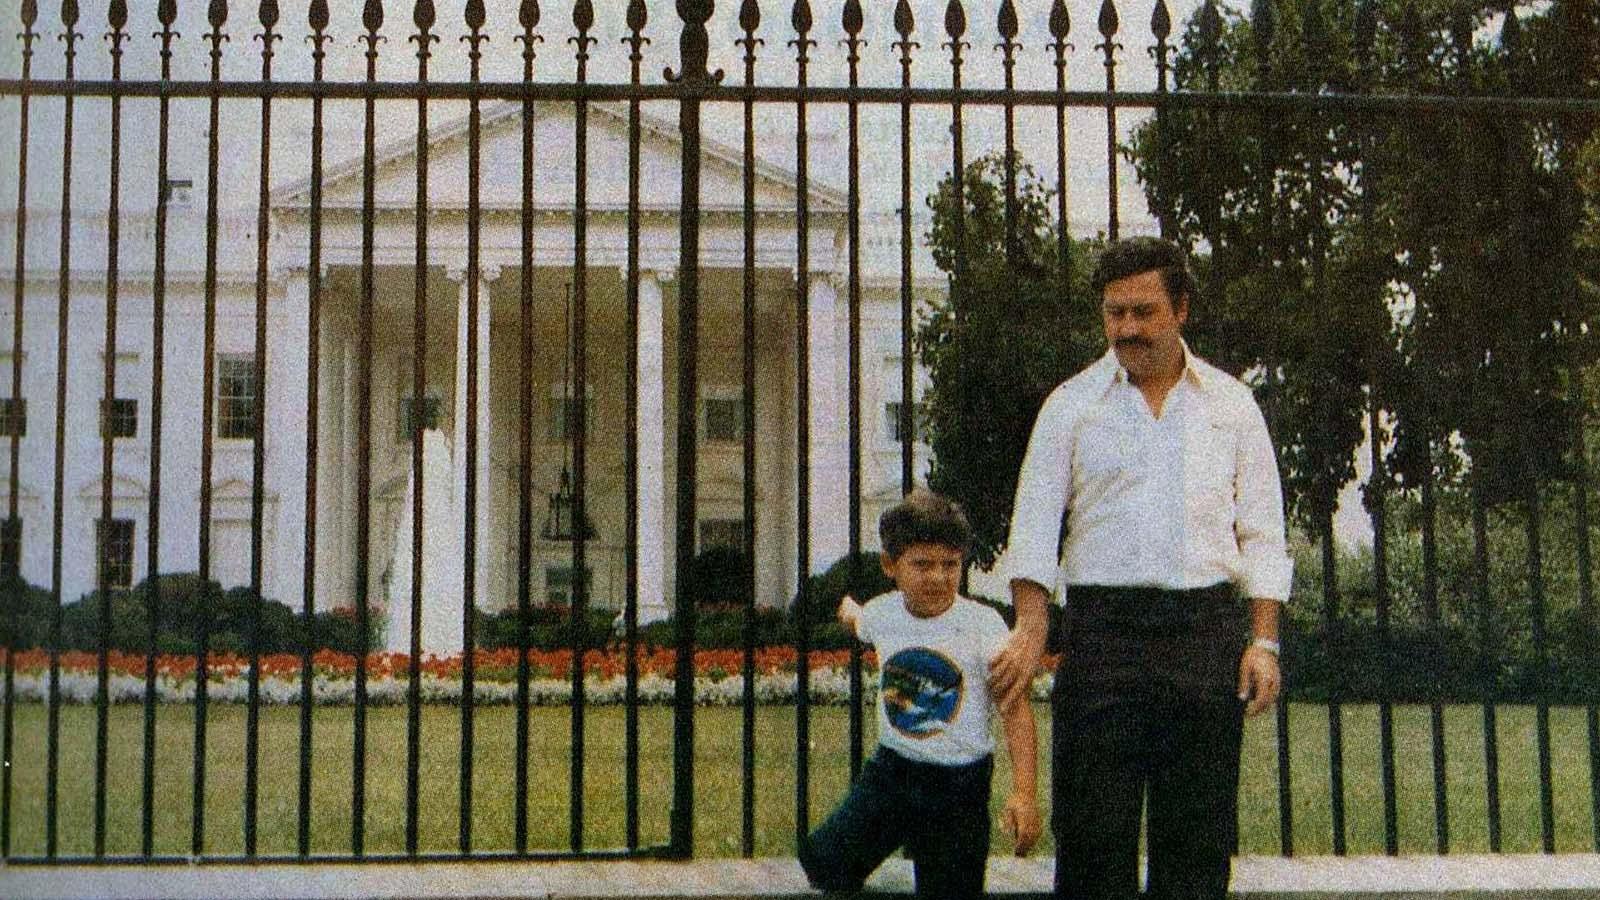 pablo escobar white house